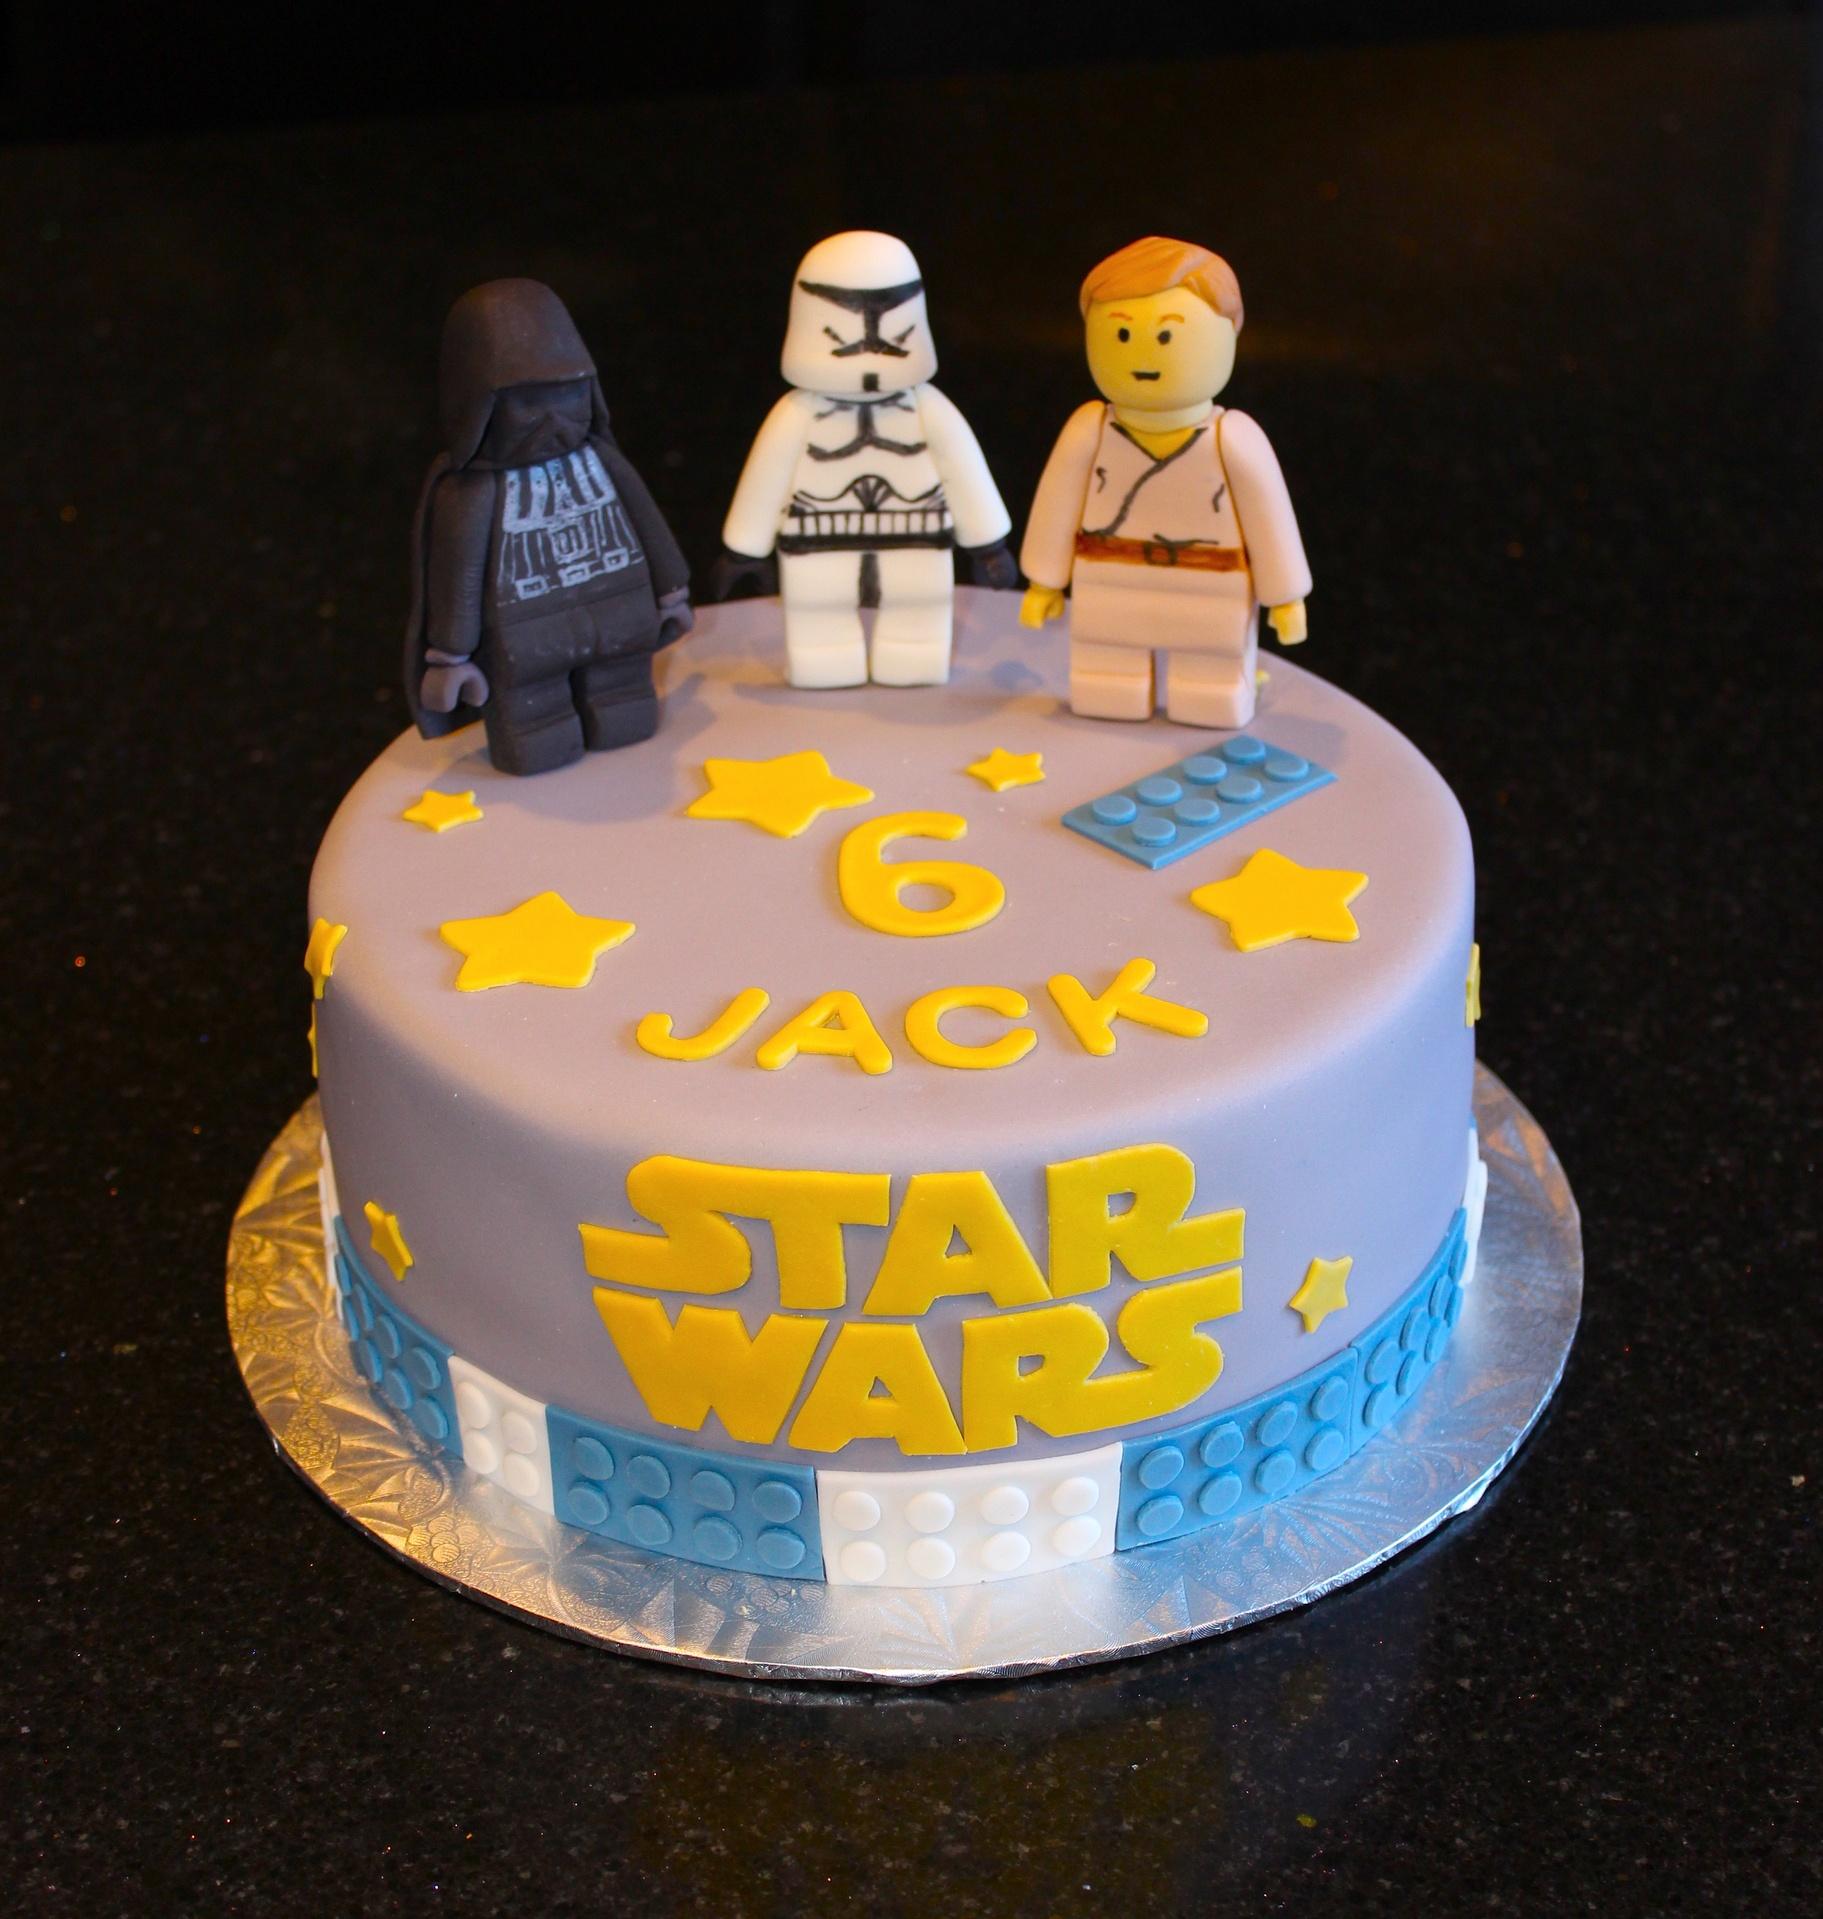 Lego Star Wars Theme Birthday Cake